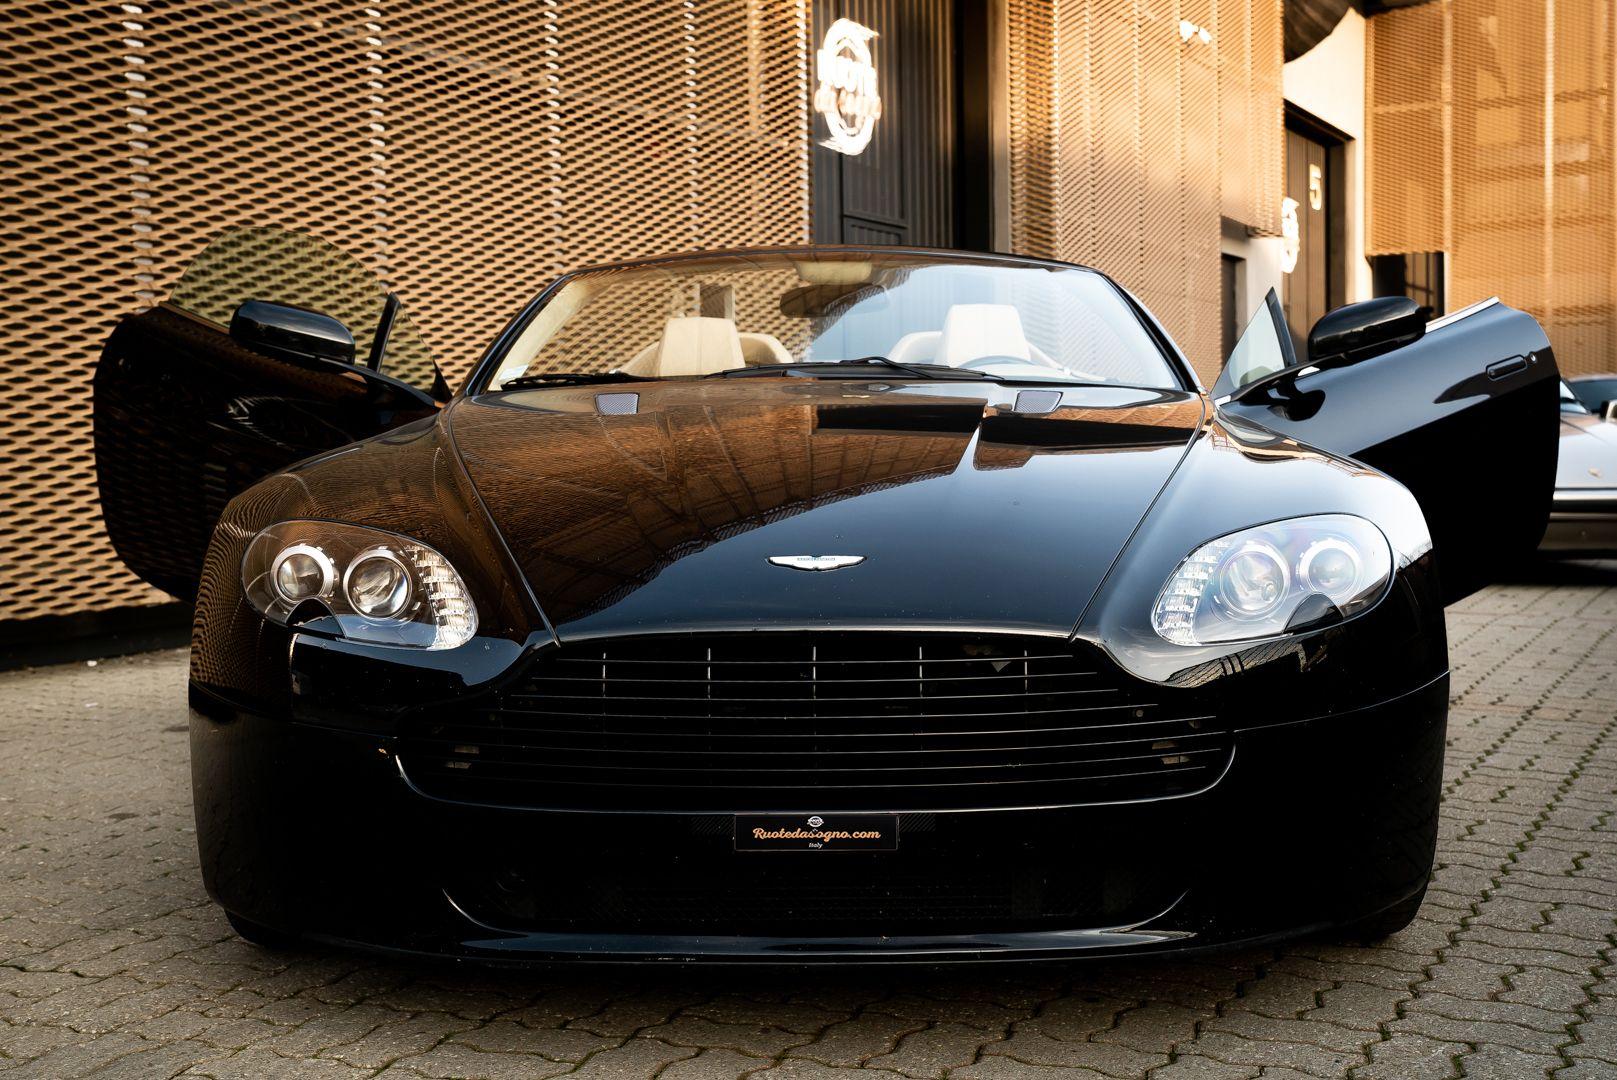 2008 Aston Martin 4.3 V8 Vantage Roadster N400 82806